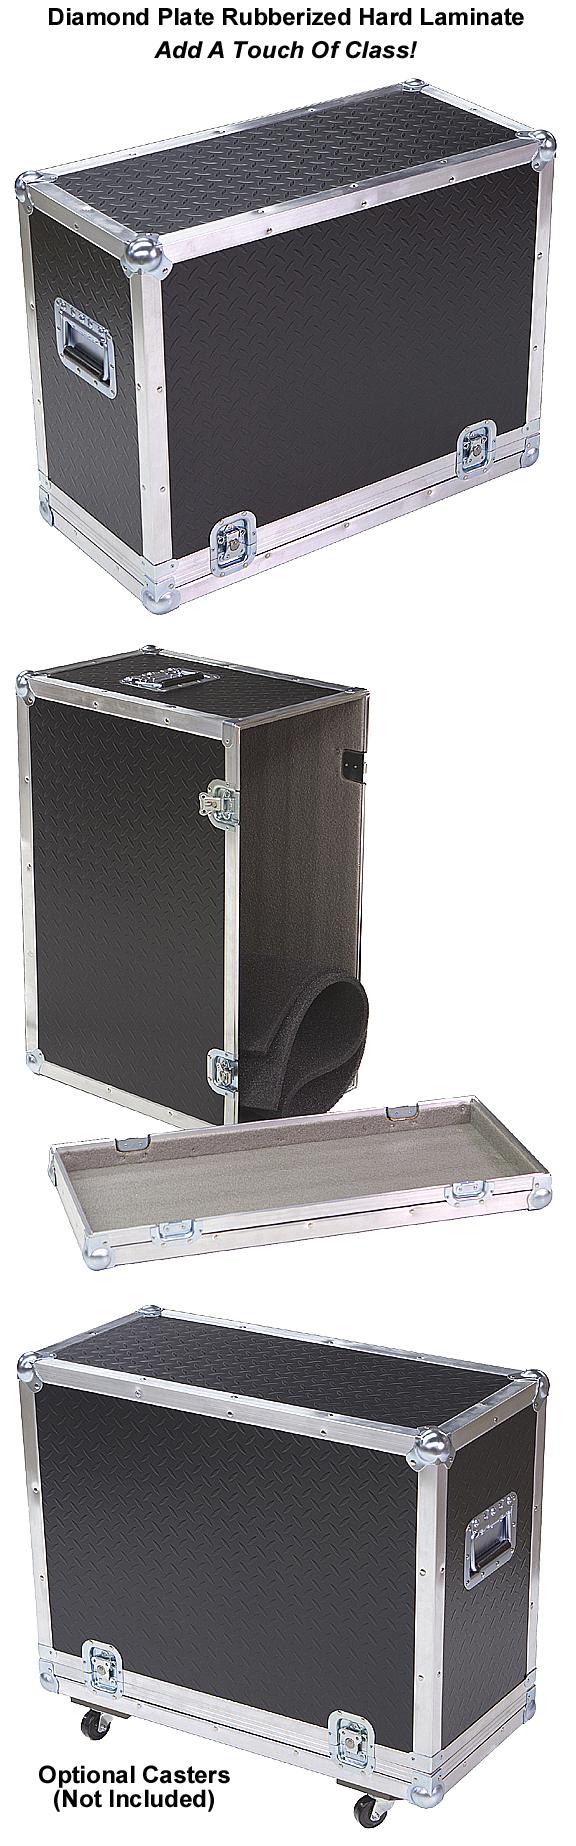 amplifier1-4diamondplatedone.jpg